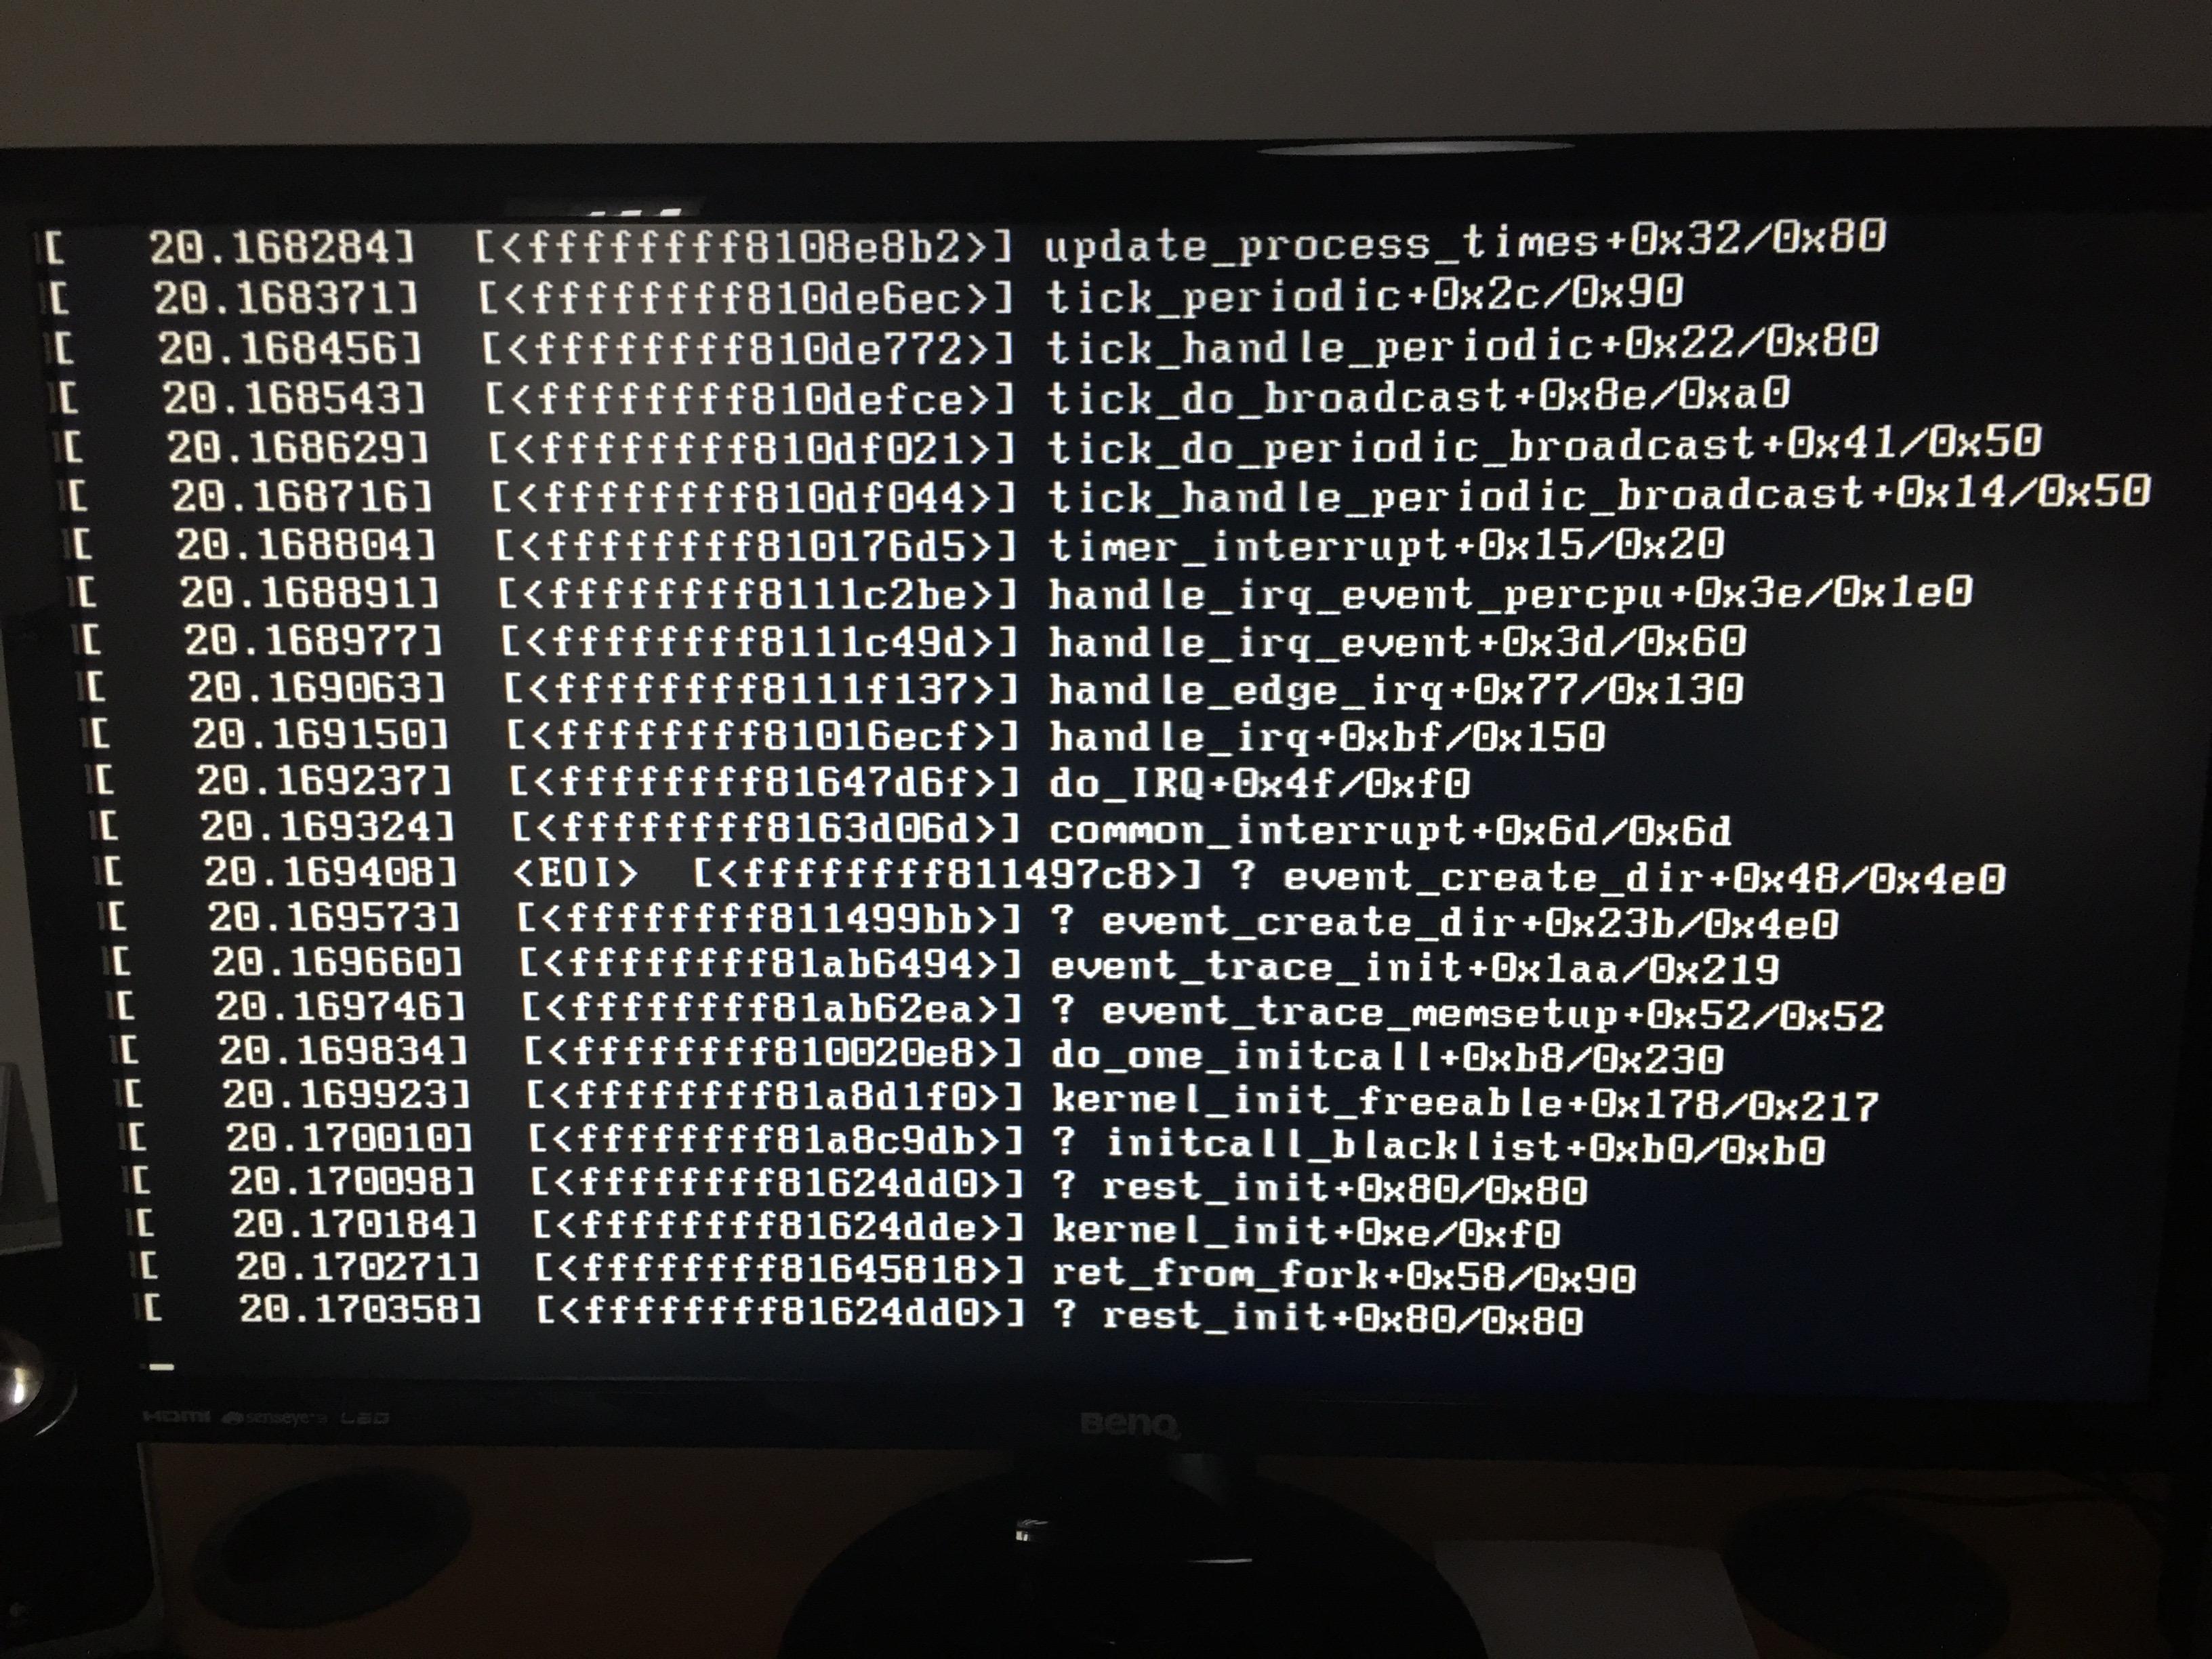 Centos 7 won't boot after yum update